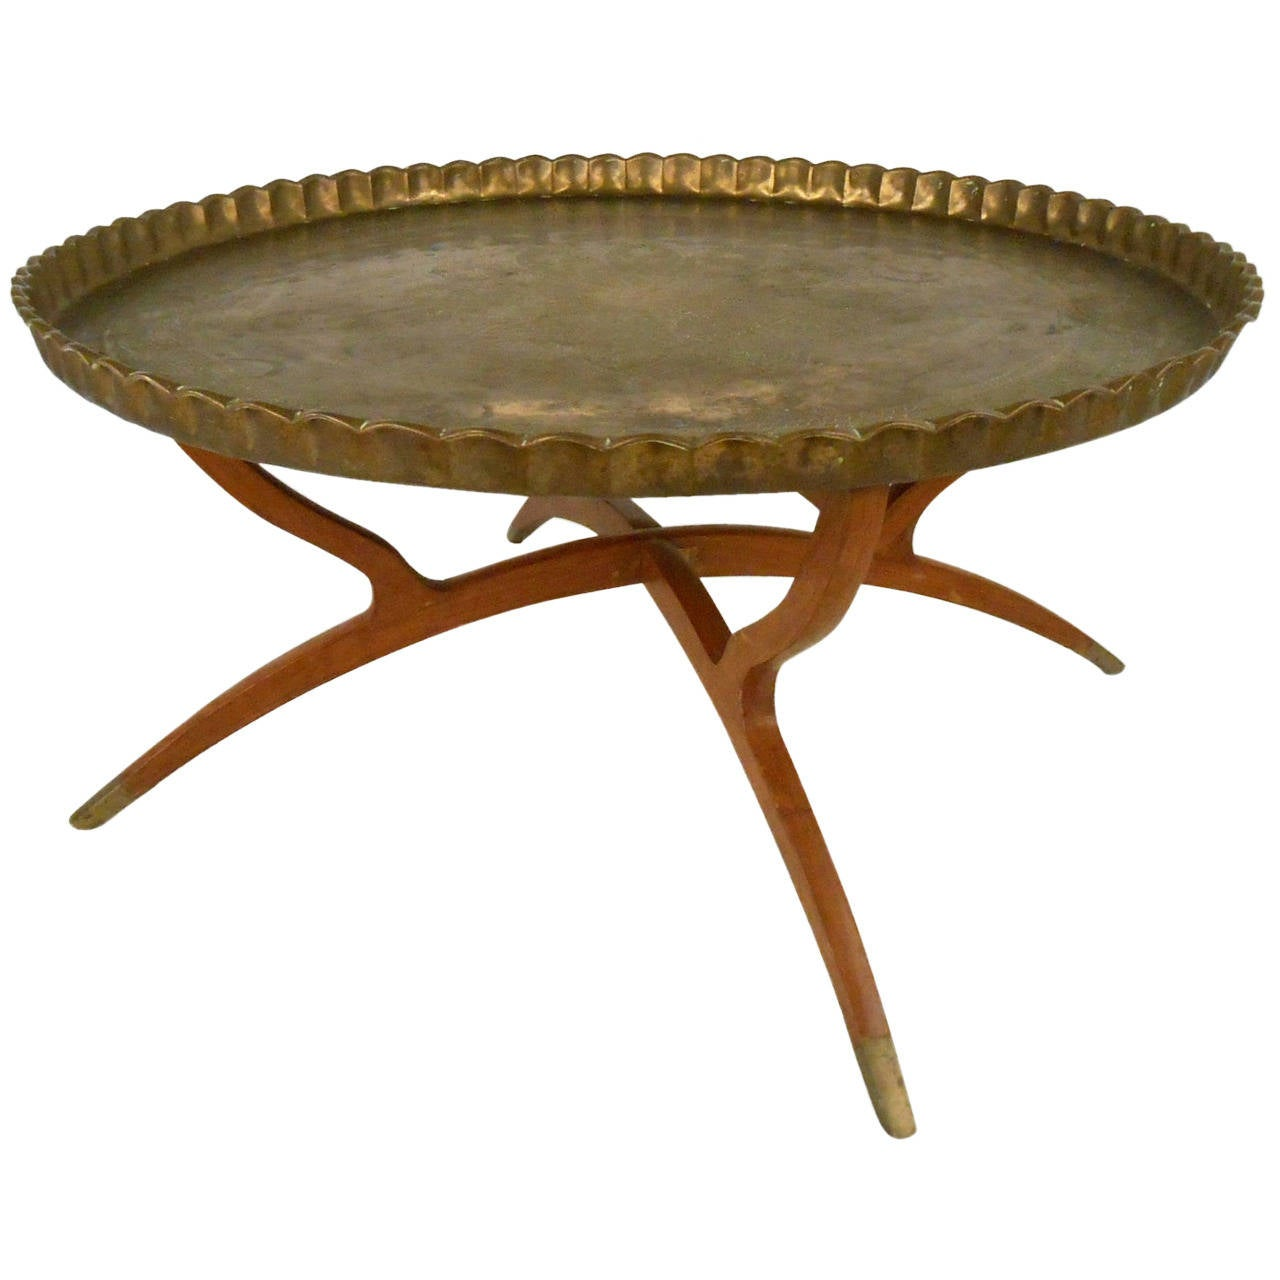 Vintage Mamluk Style Persian Brass Tray Table At 1stdibs